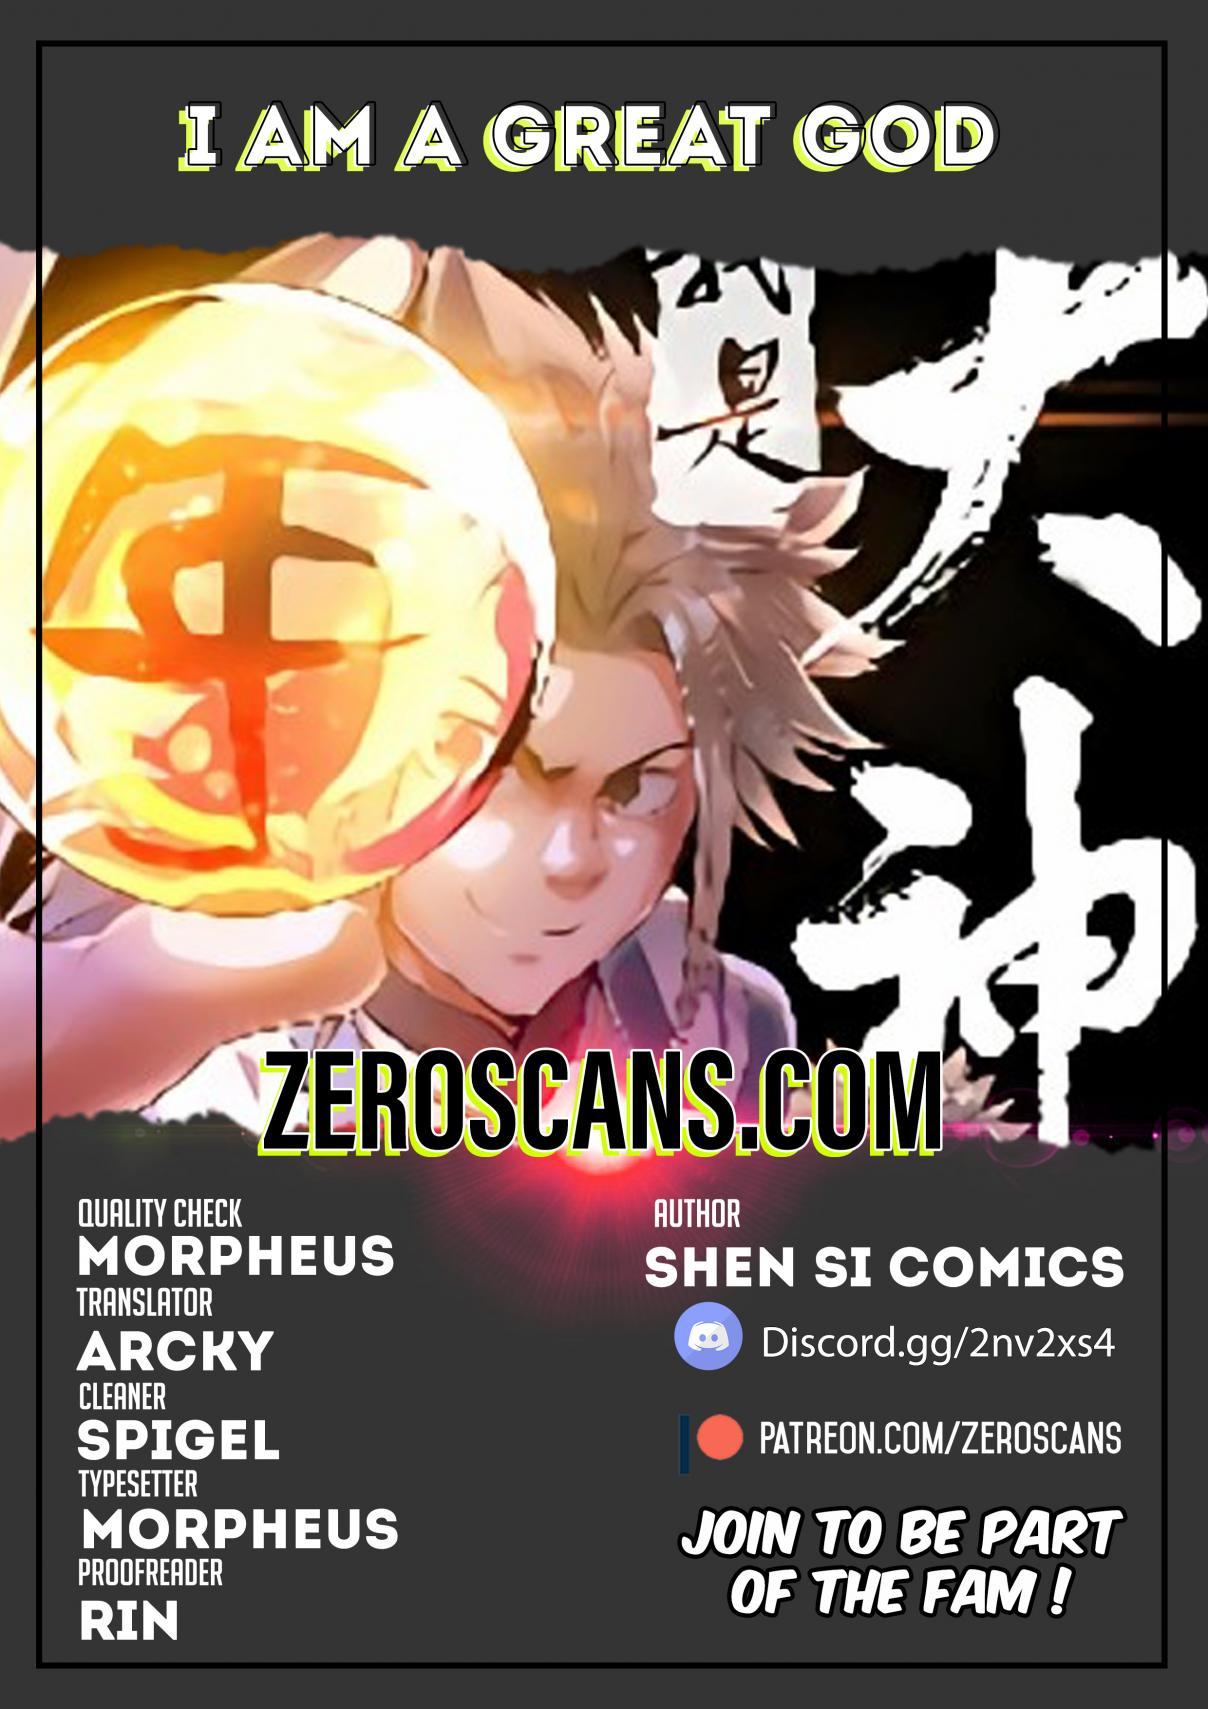 https://im.nineanime.com/comics/pic9/4/21124/491113/ce7cf3a2f1334f82df304f443b1339ef.jpg Page 1